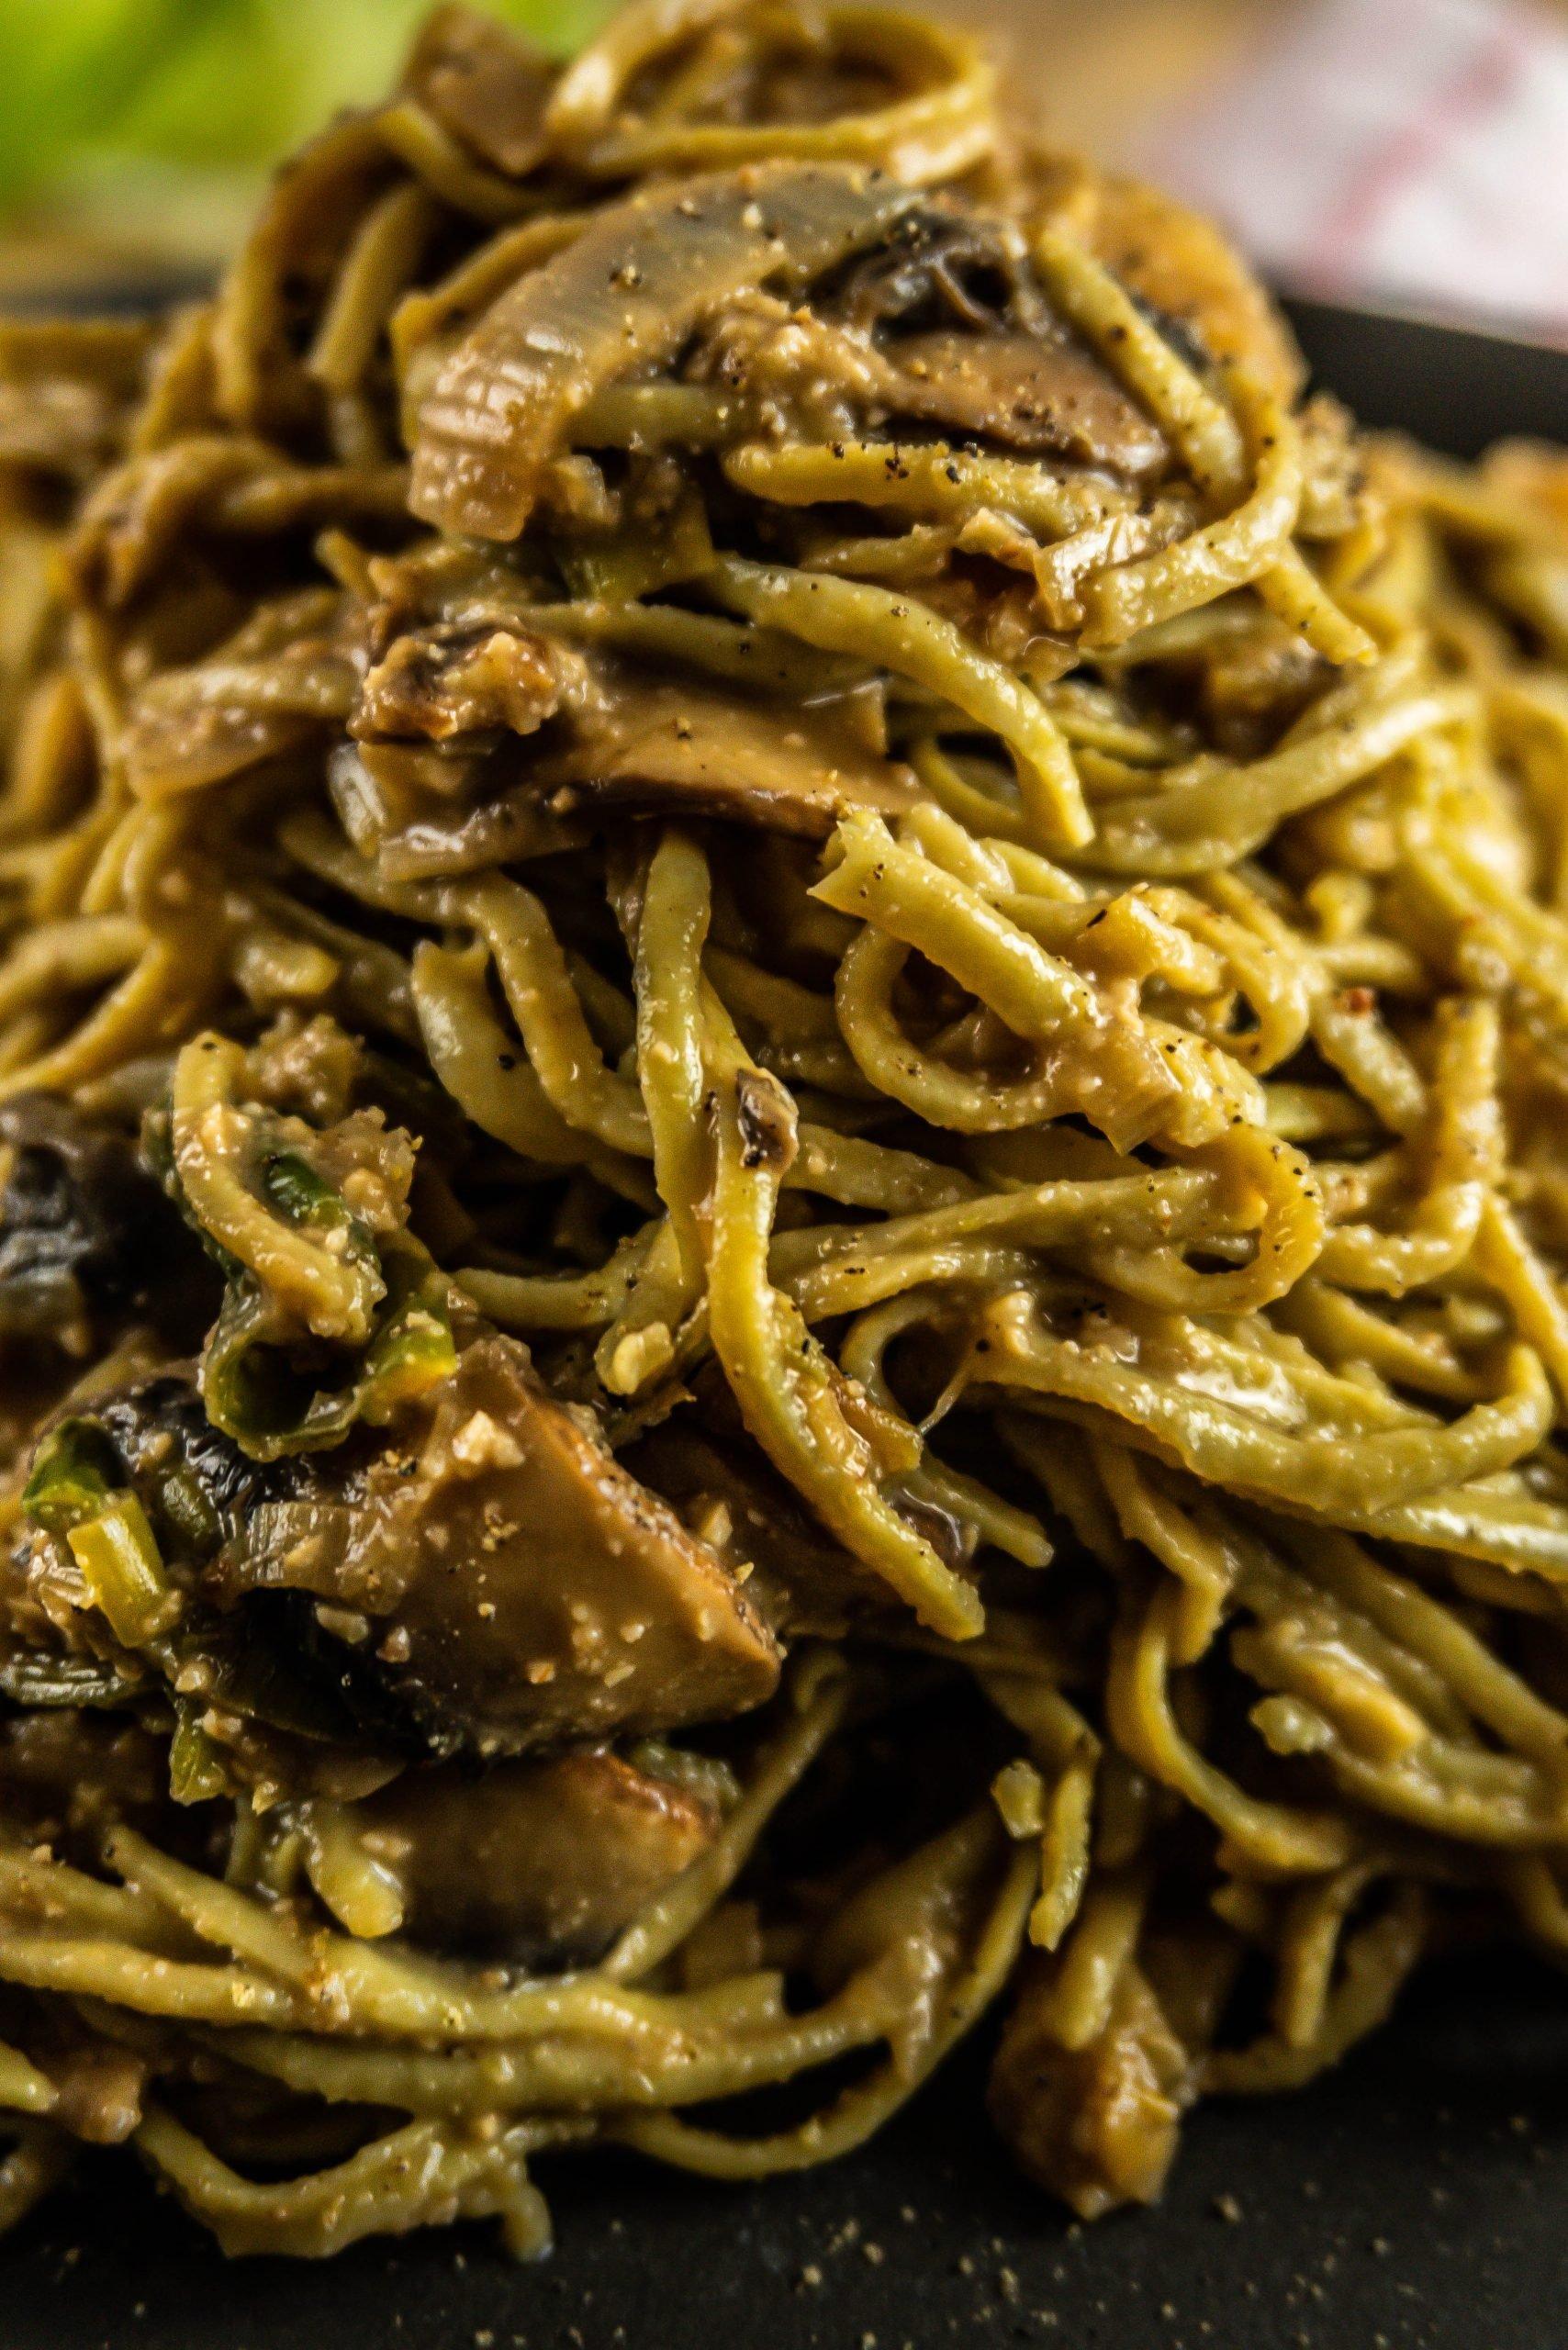 Creamy Mushroom and Leek Pasta photographed up close